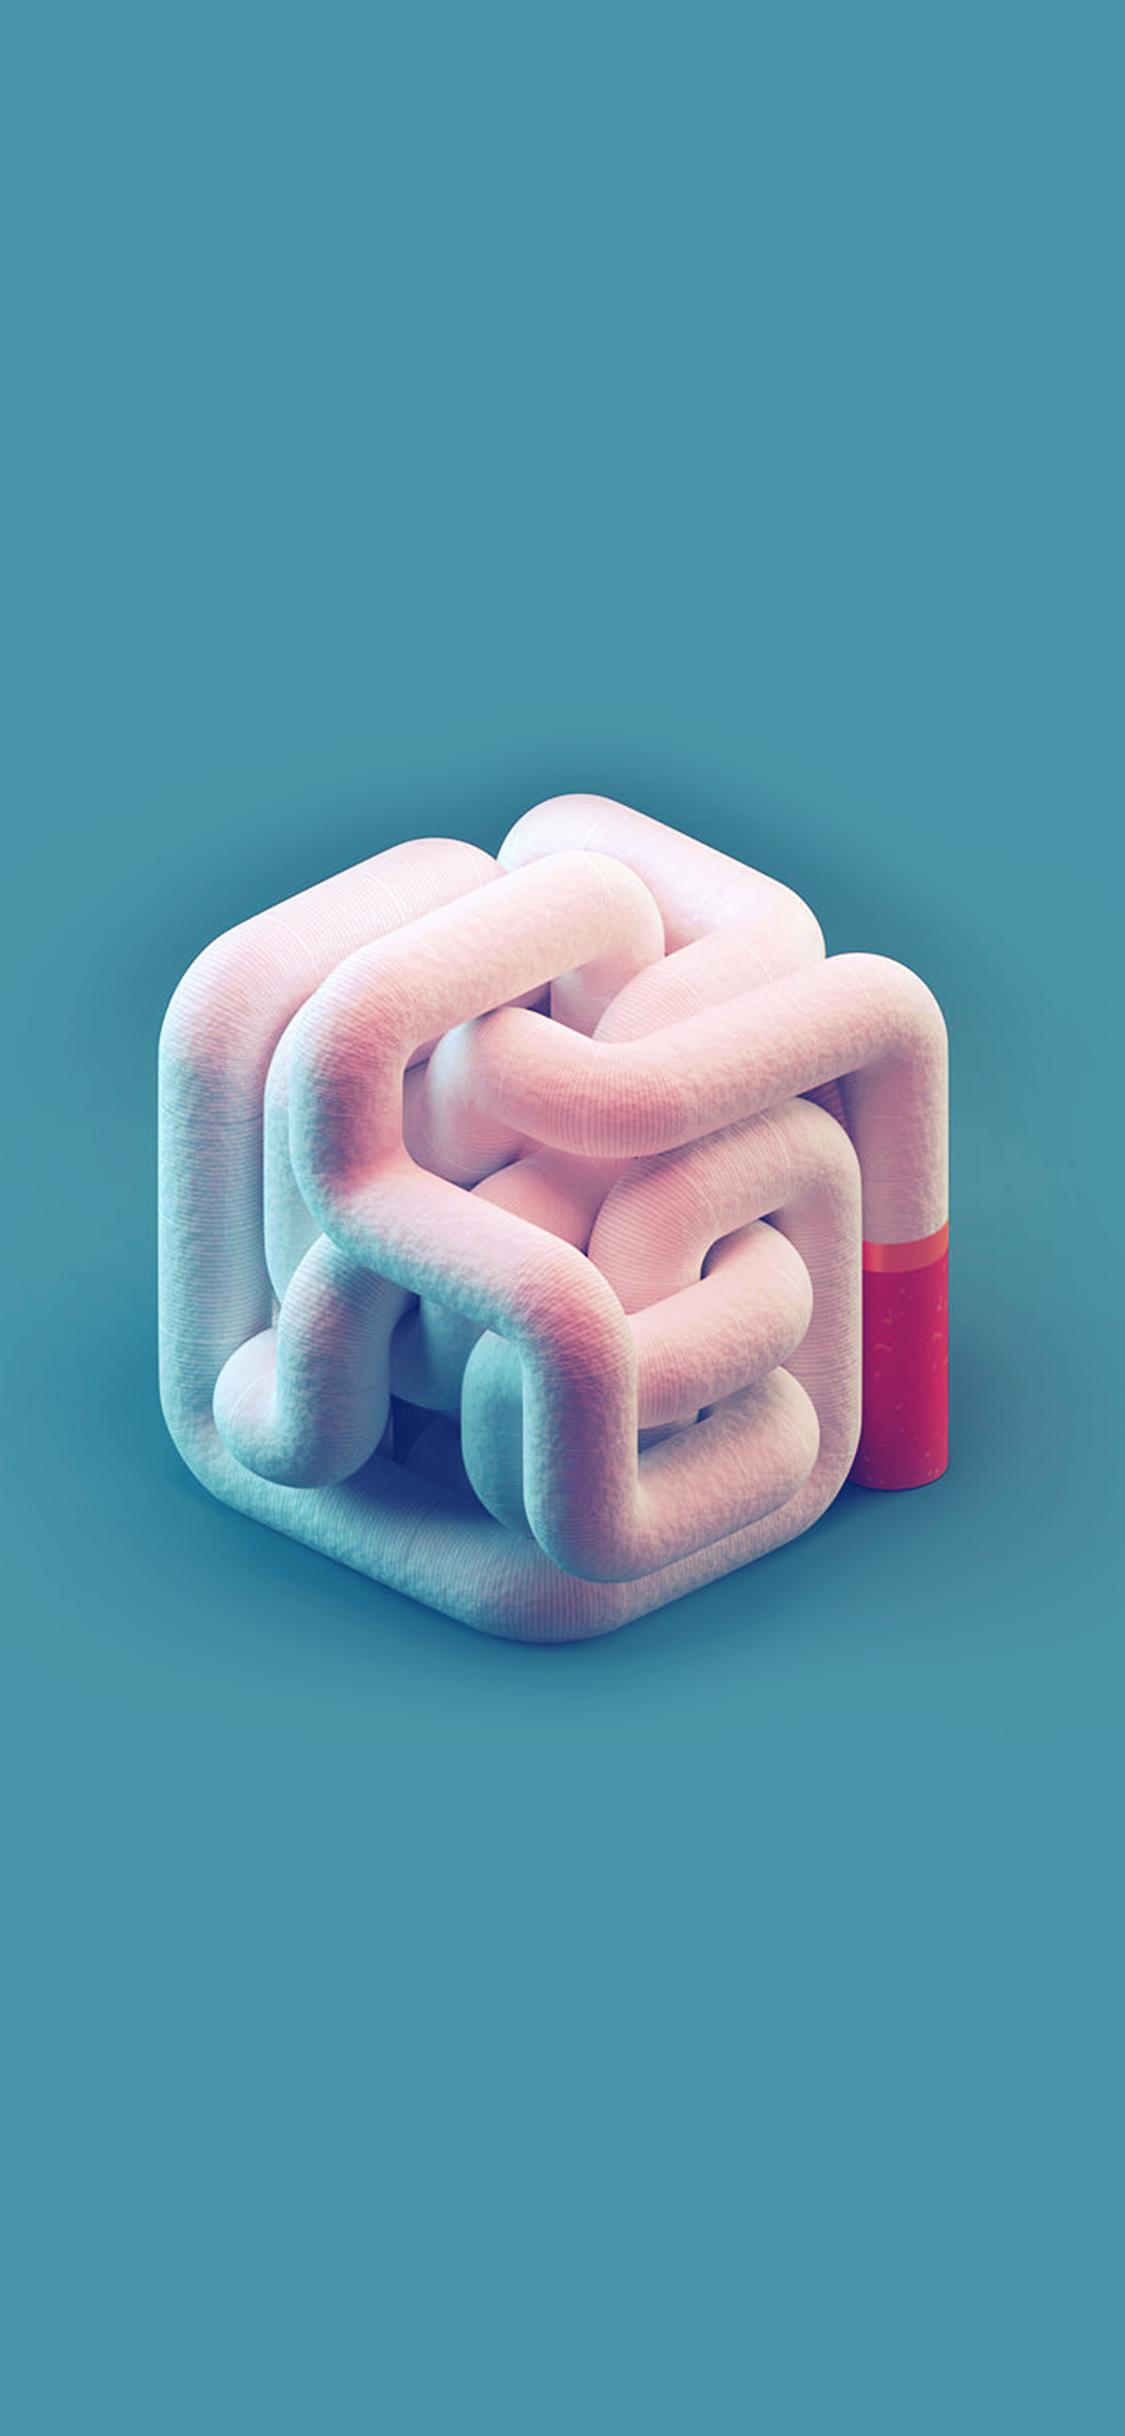 iPhonexpapers.com-Apple-iPhone-wallpaper-ay30-cigarette-smoke-minimal-blue-pink-illustration-art